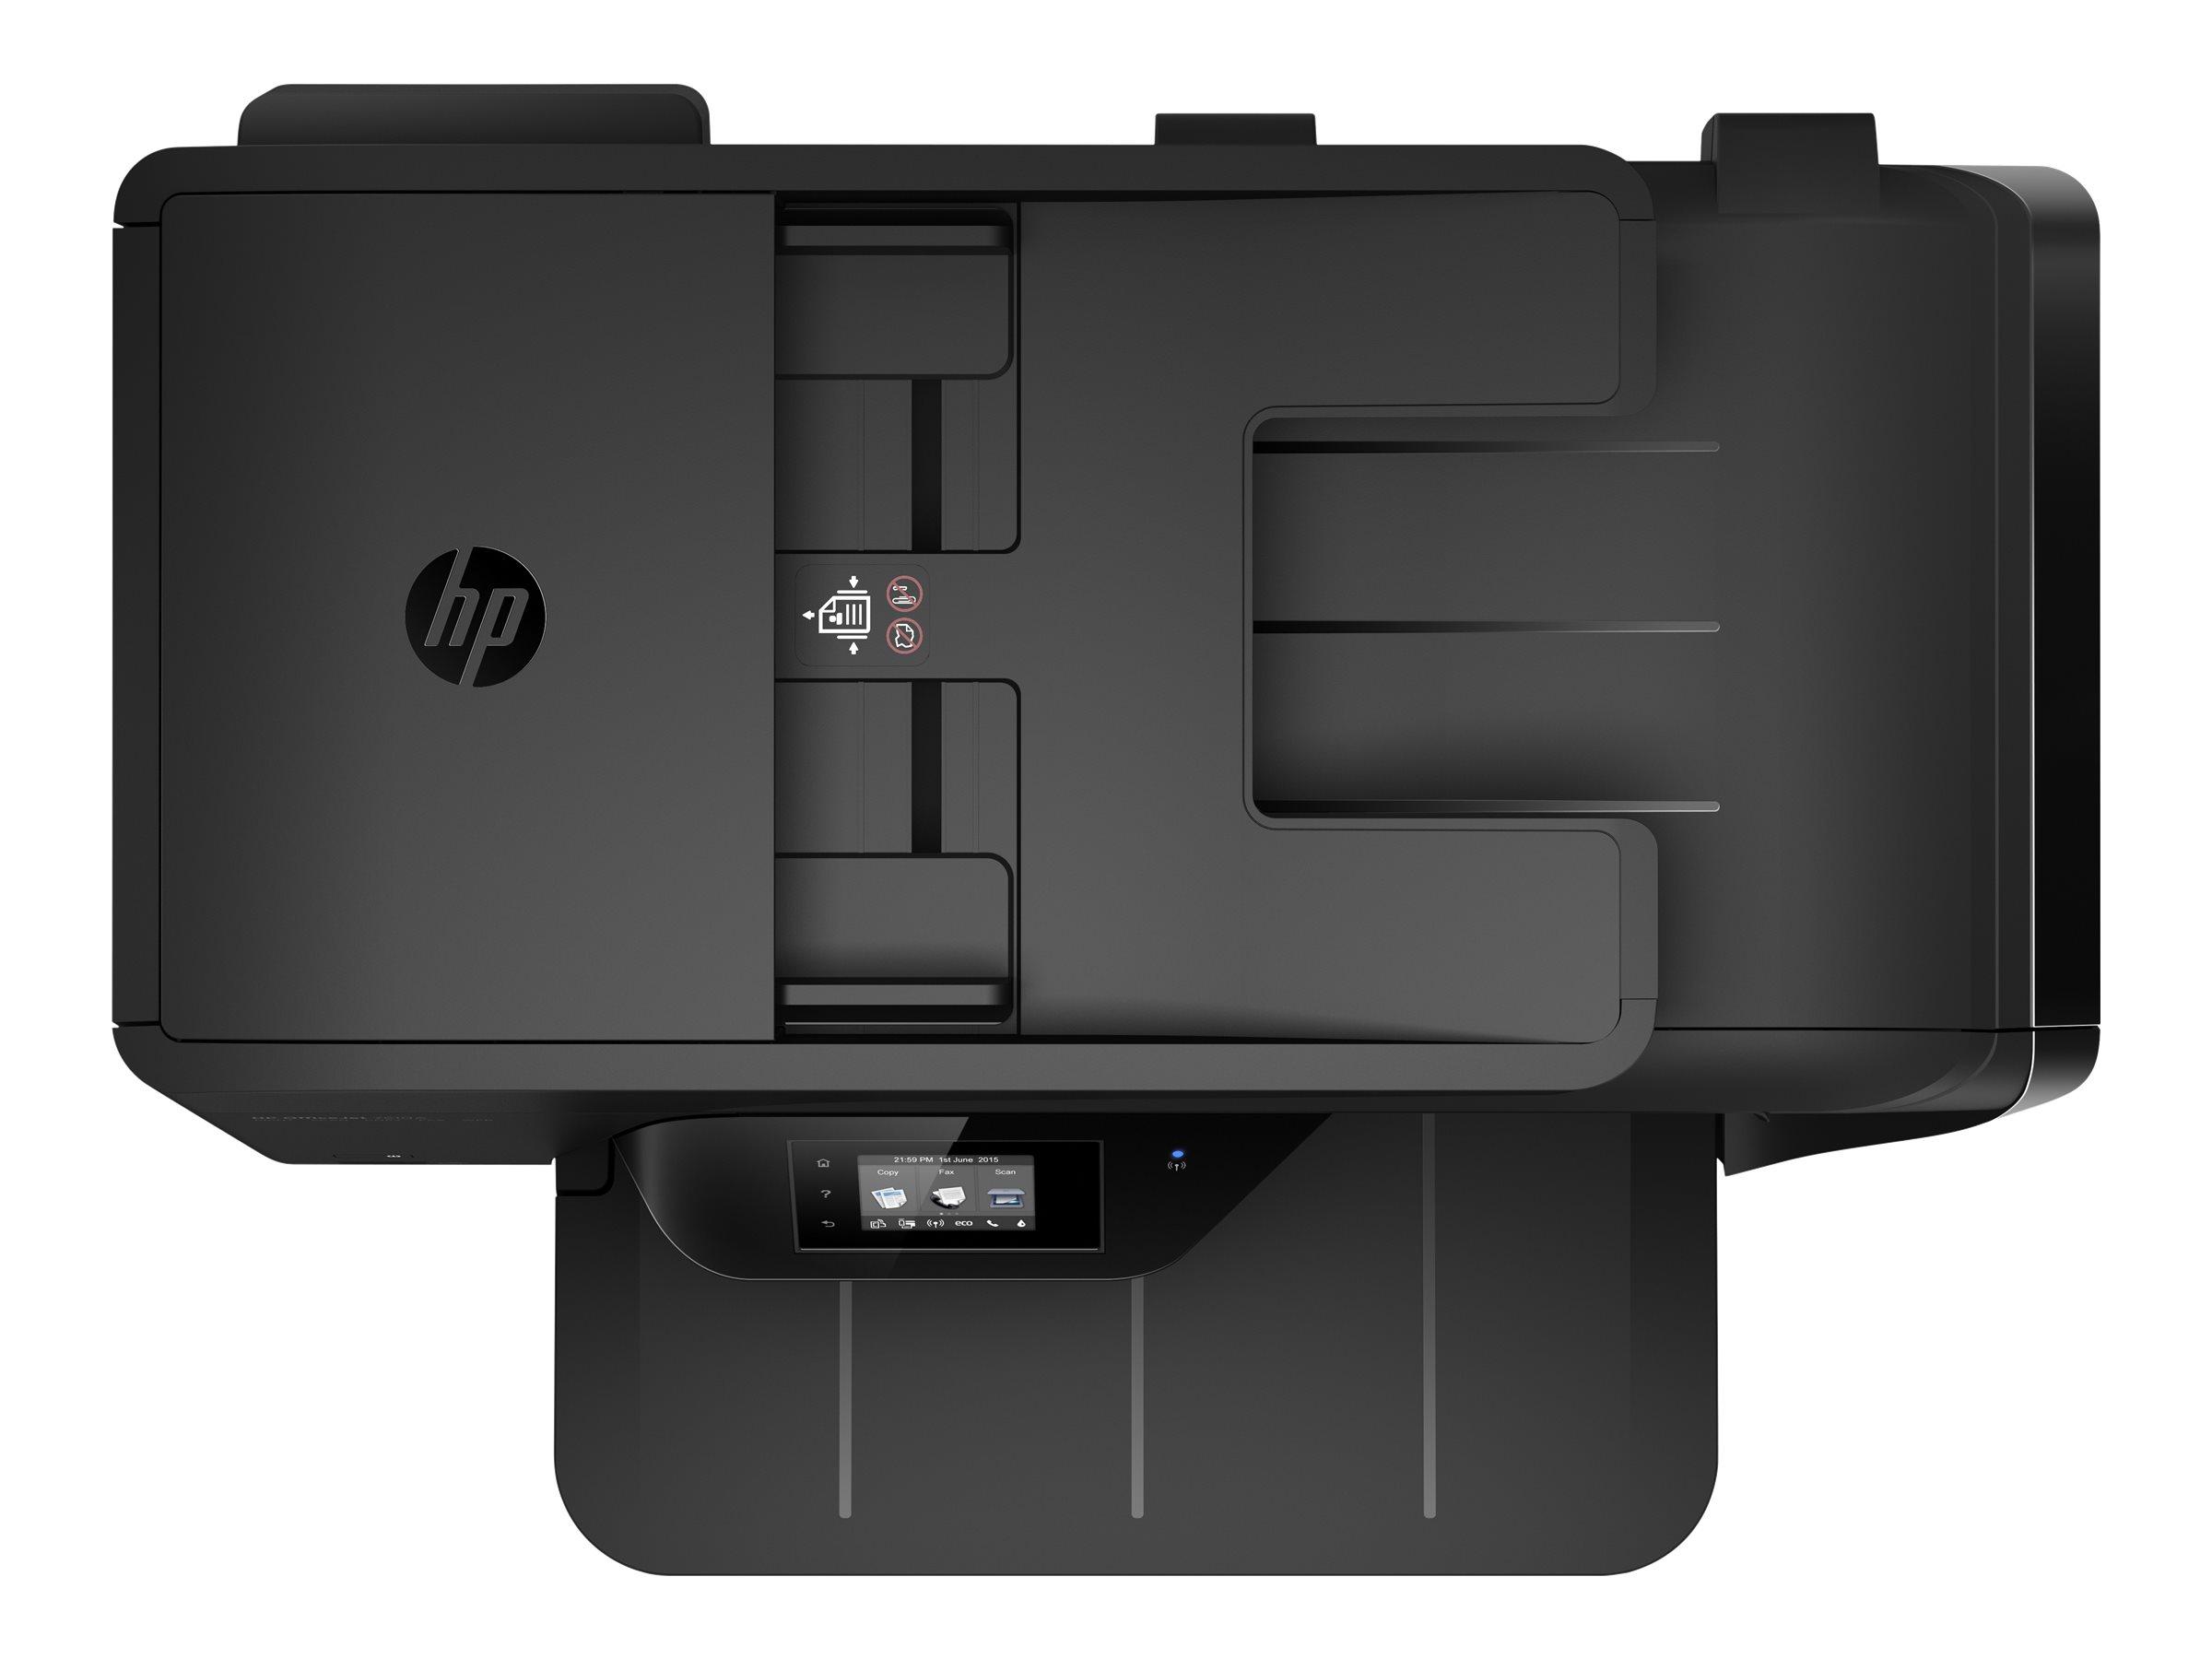 hp officejet 7510 wide format all in one imprimante multifonctions couleur imprimantes jet. Black Bedroom Furniture Sets. Home Design Ideas